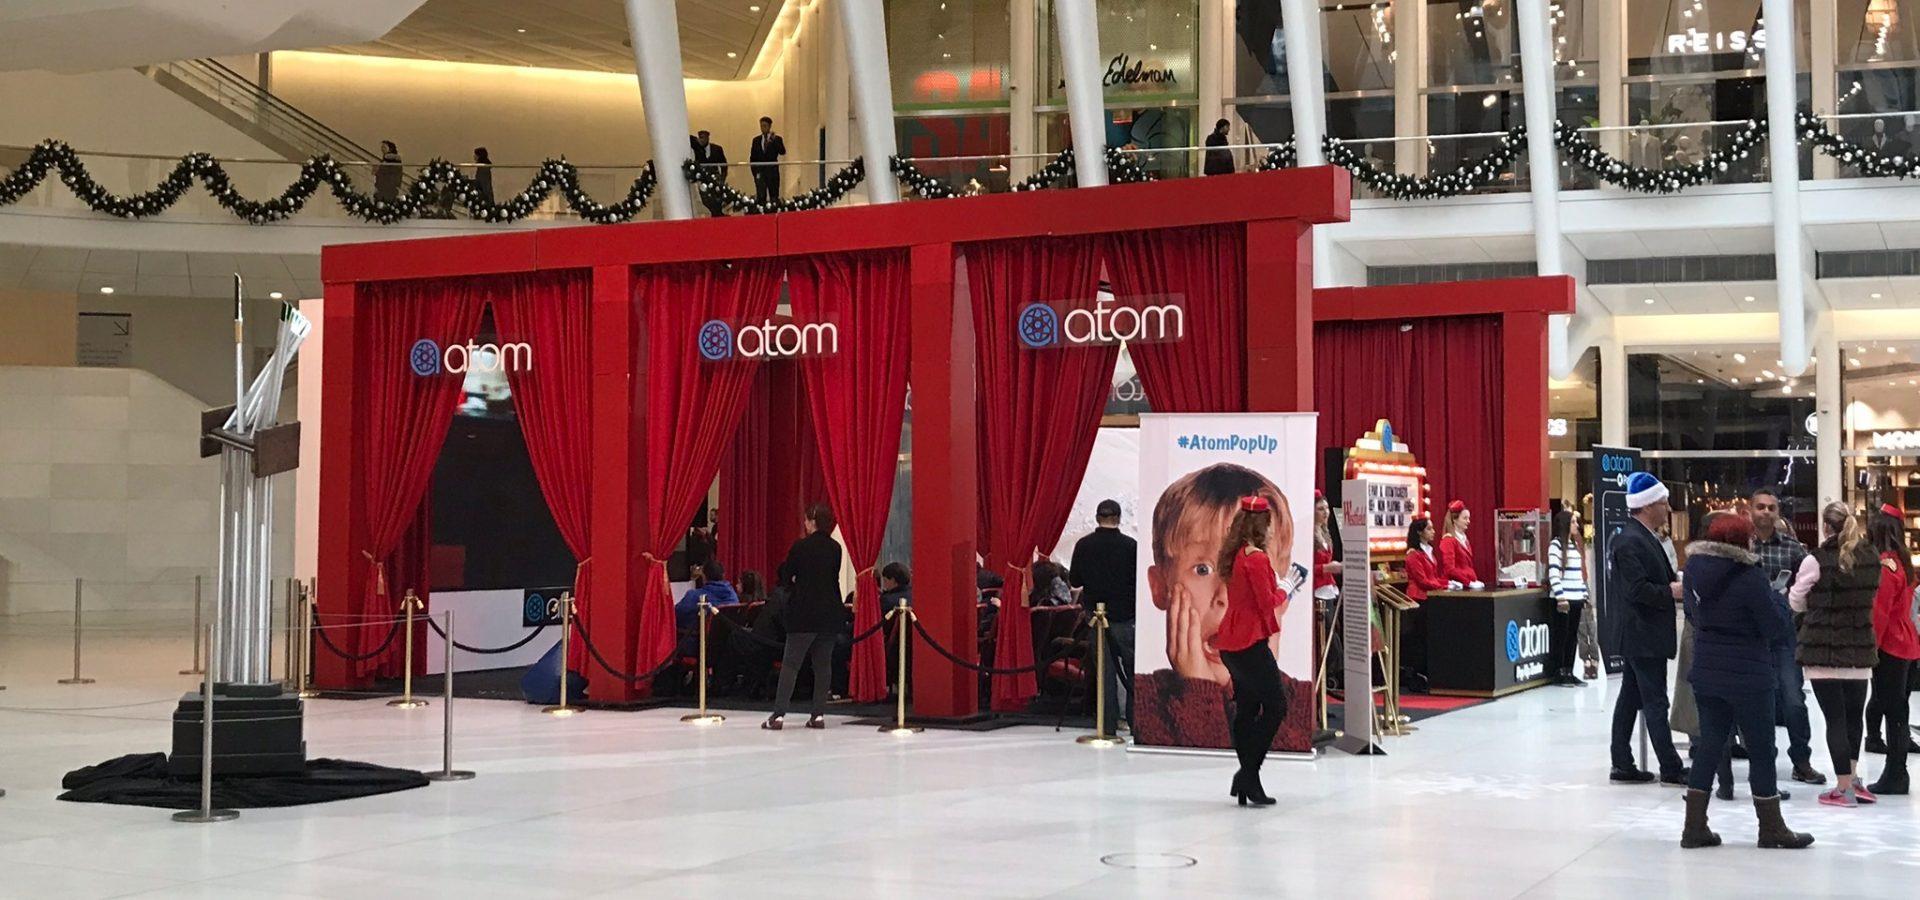 atom pop up theater oculus center NY